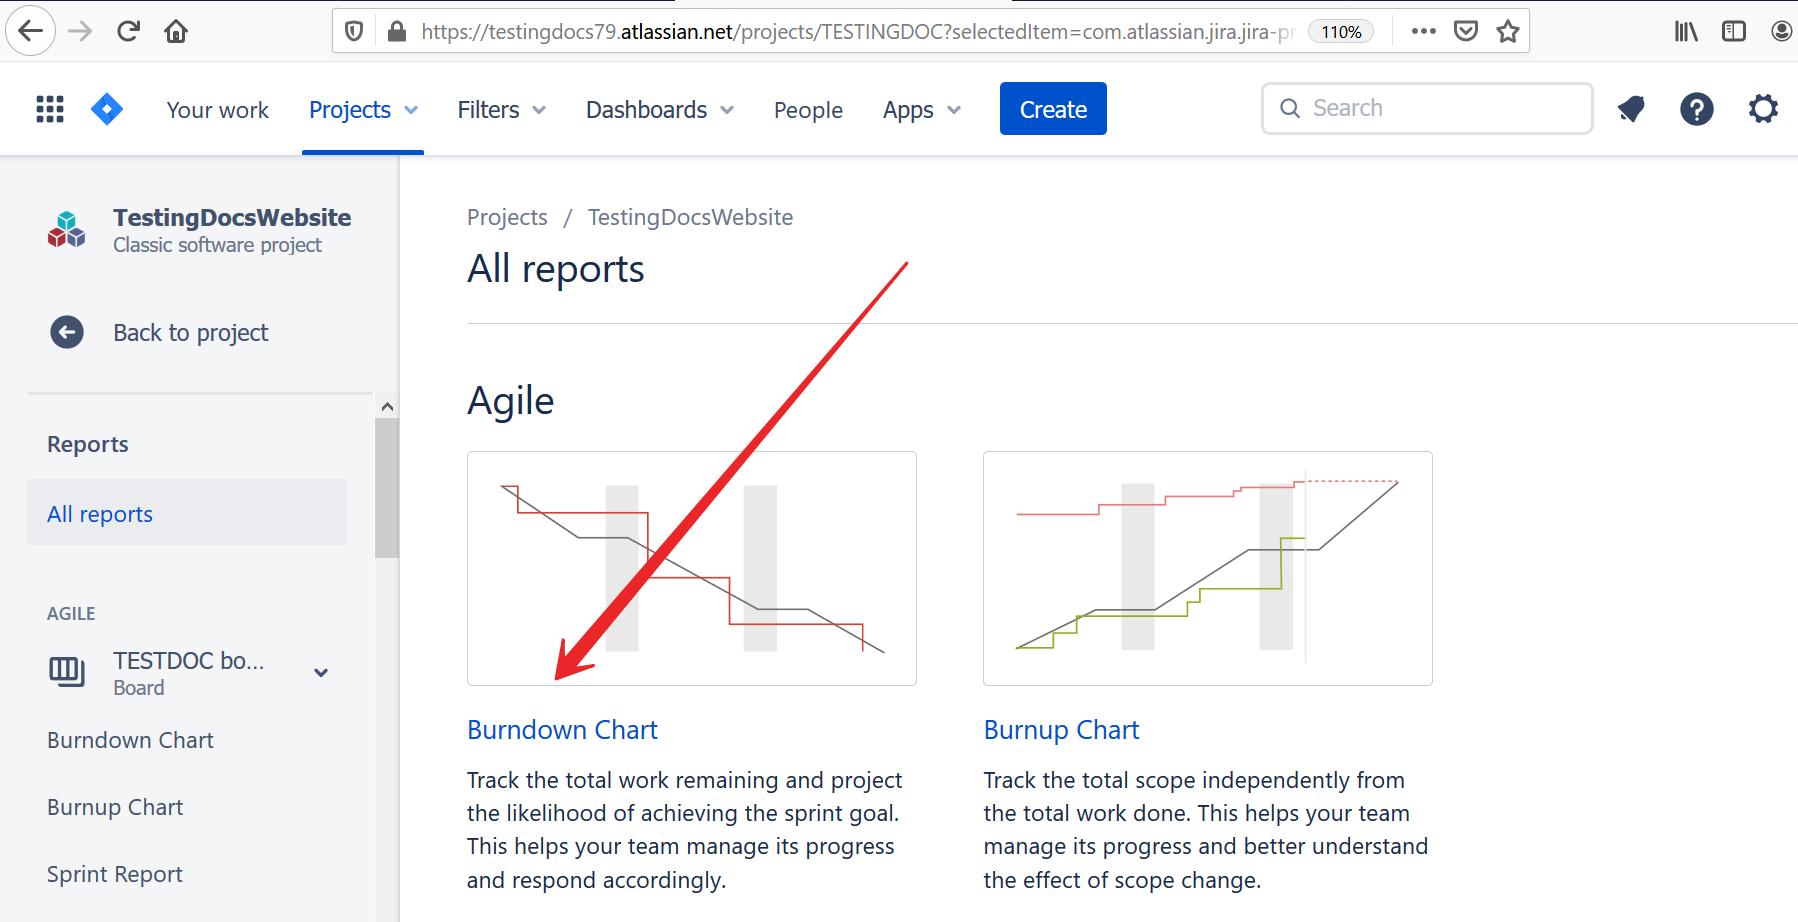 Sprint Burndown Chart